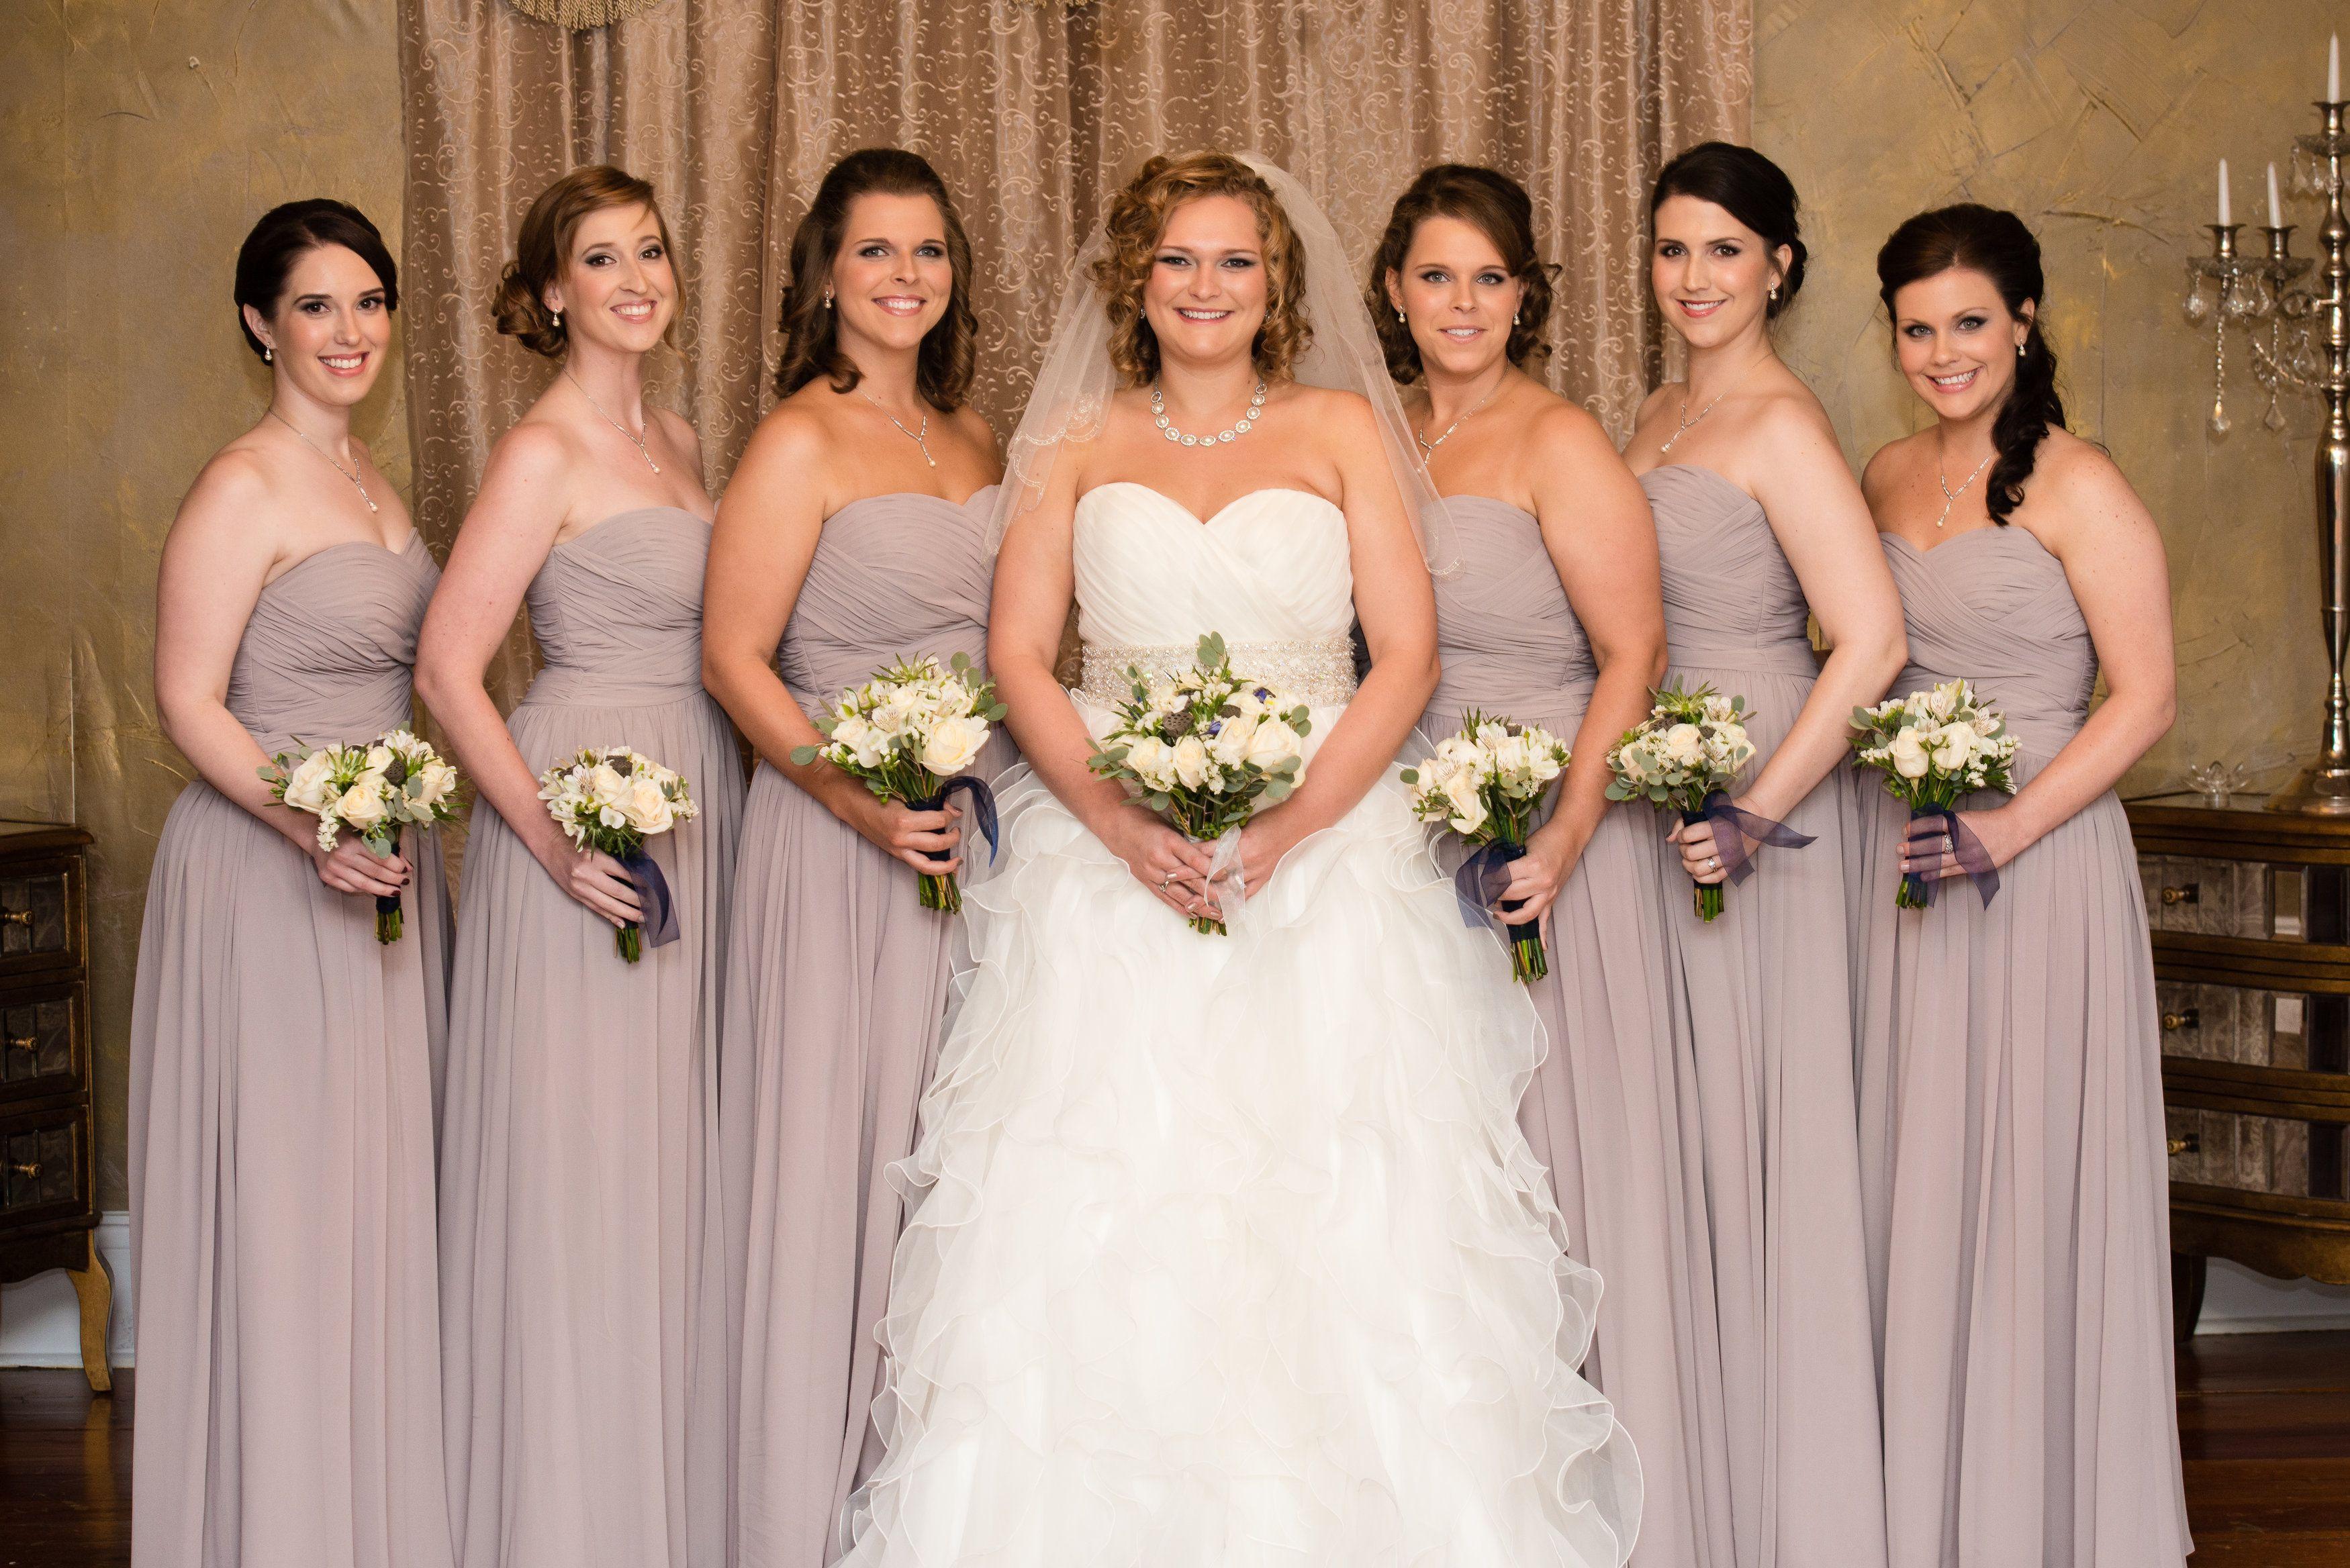 Bridesmaid dresses taupe junoir bridesmaid dresses bridesmaid dresses taupe 26 ombrellifo Gallery